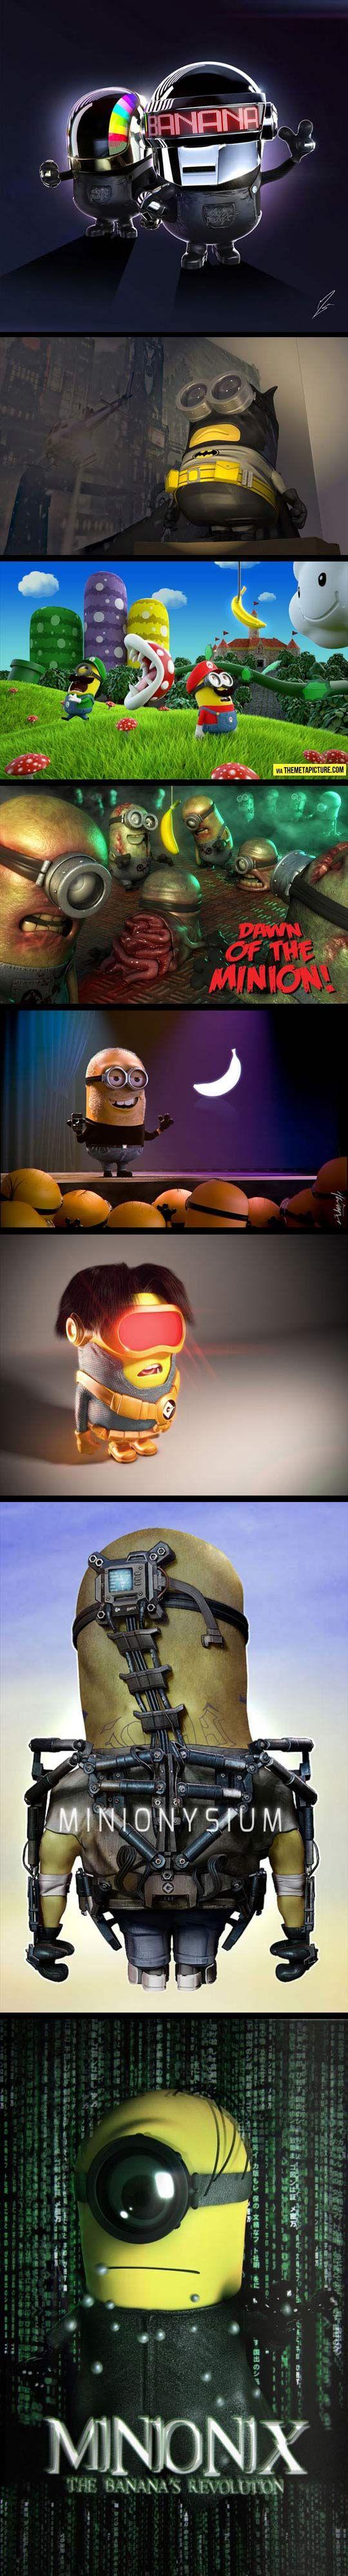 Minions… Minions Everywhere